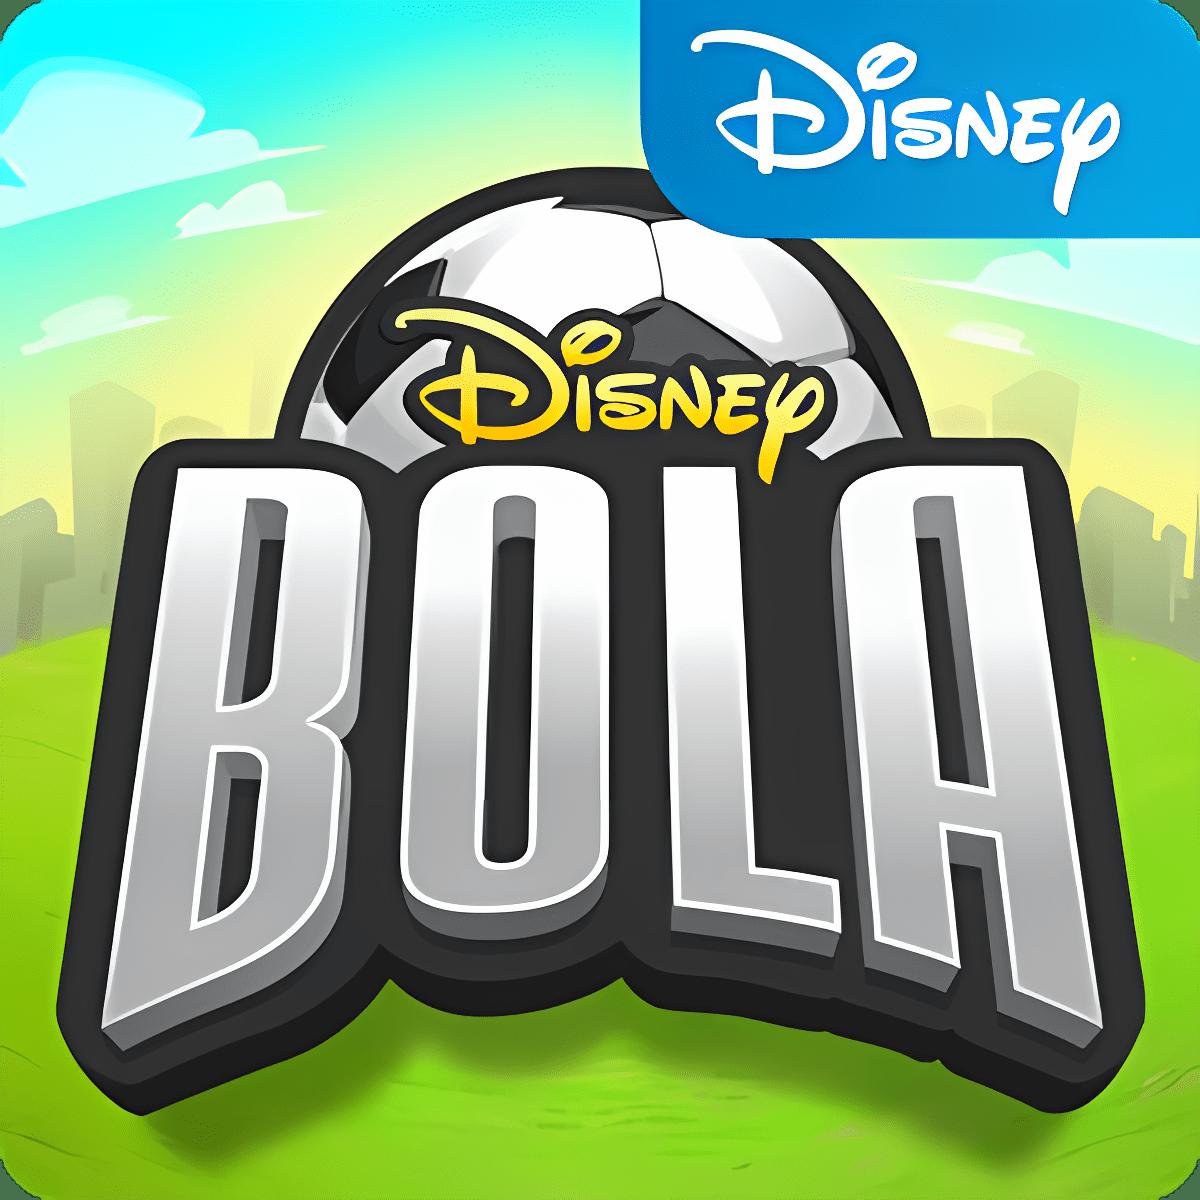 Disney Bola 1.0